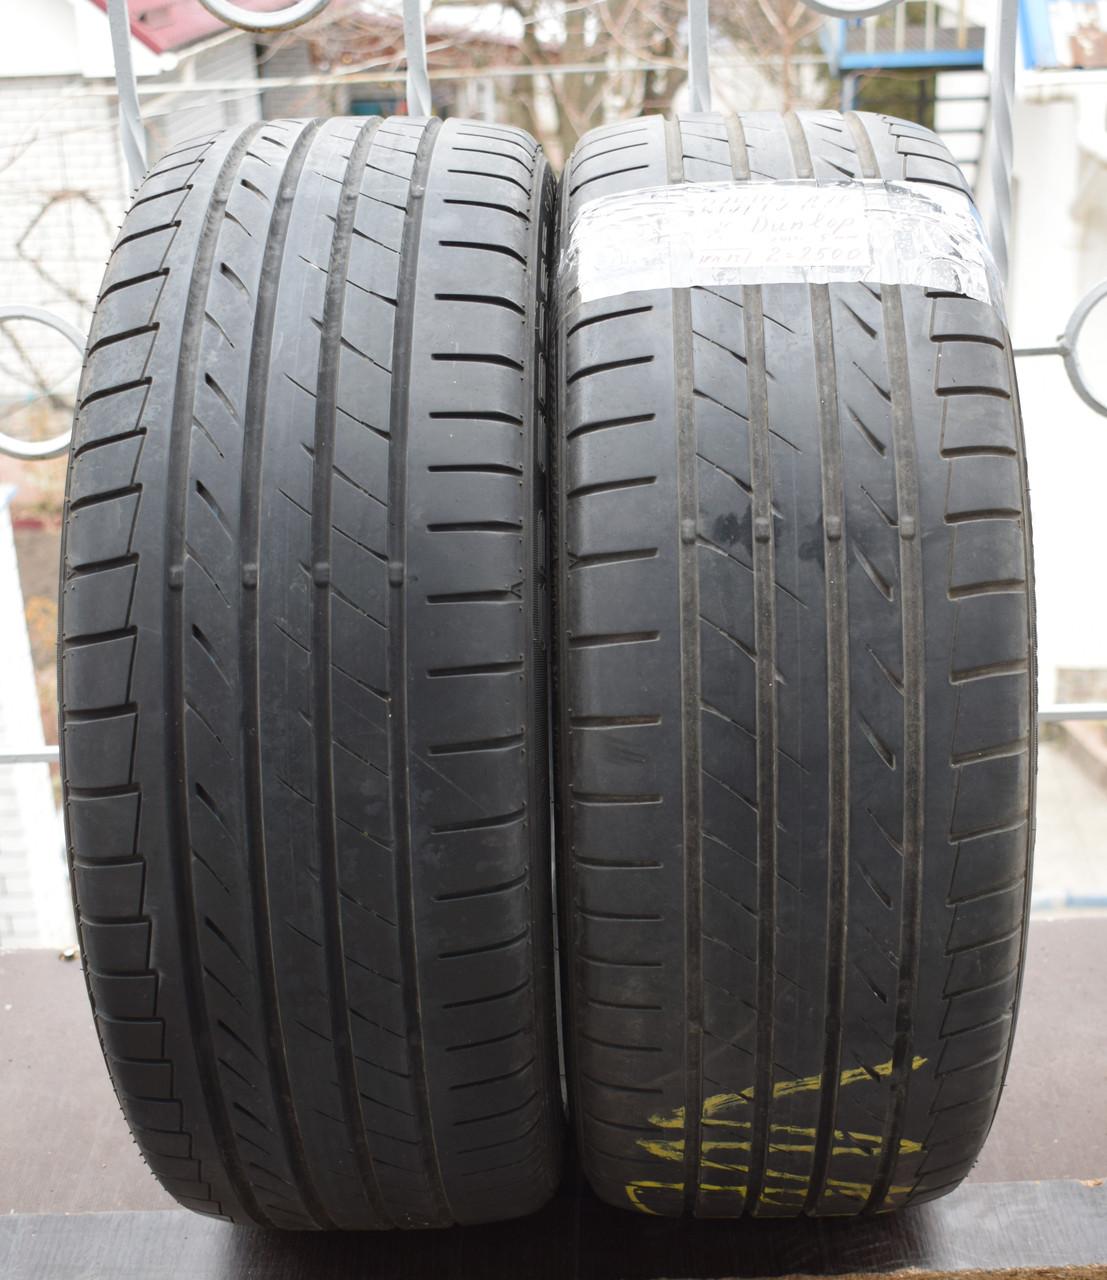 Летние шины б/у 215/45 R18 Dunlop SP Sport Maxx TT, пара